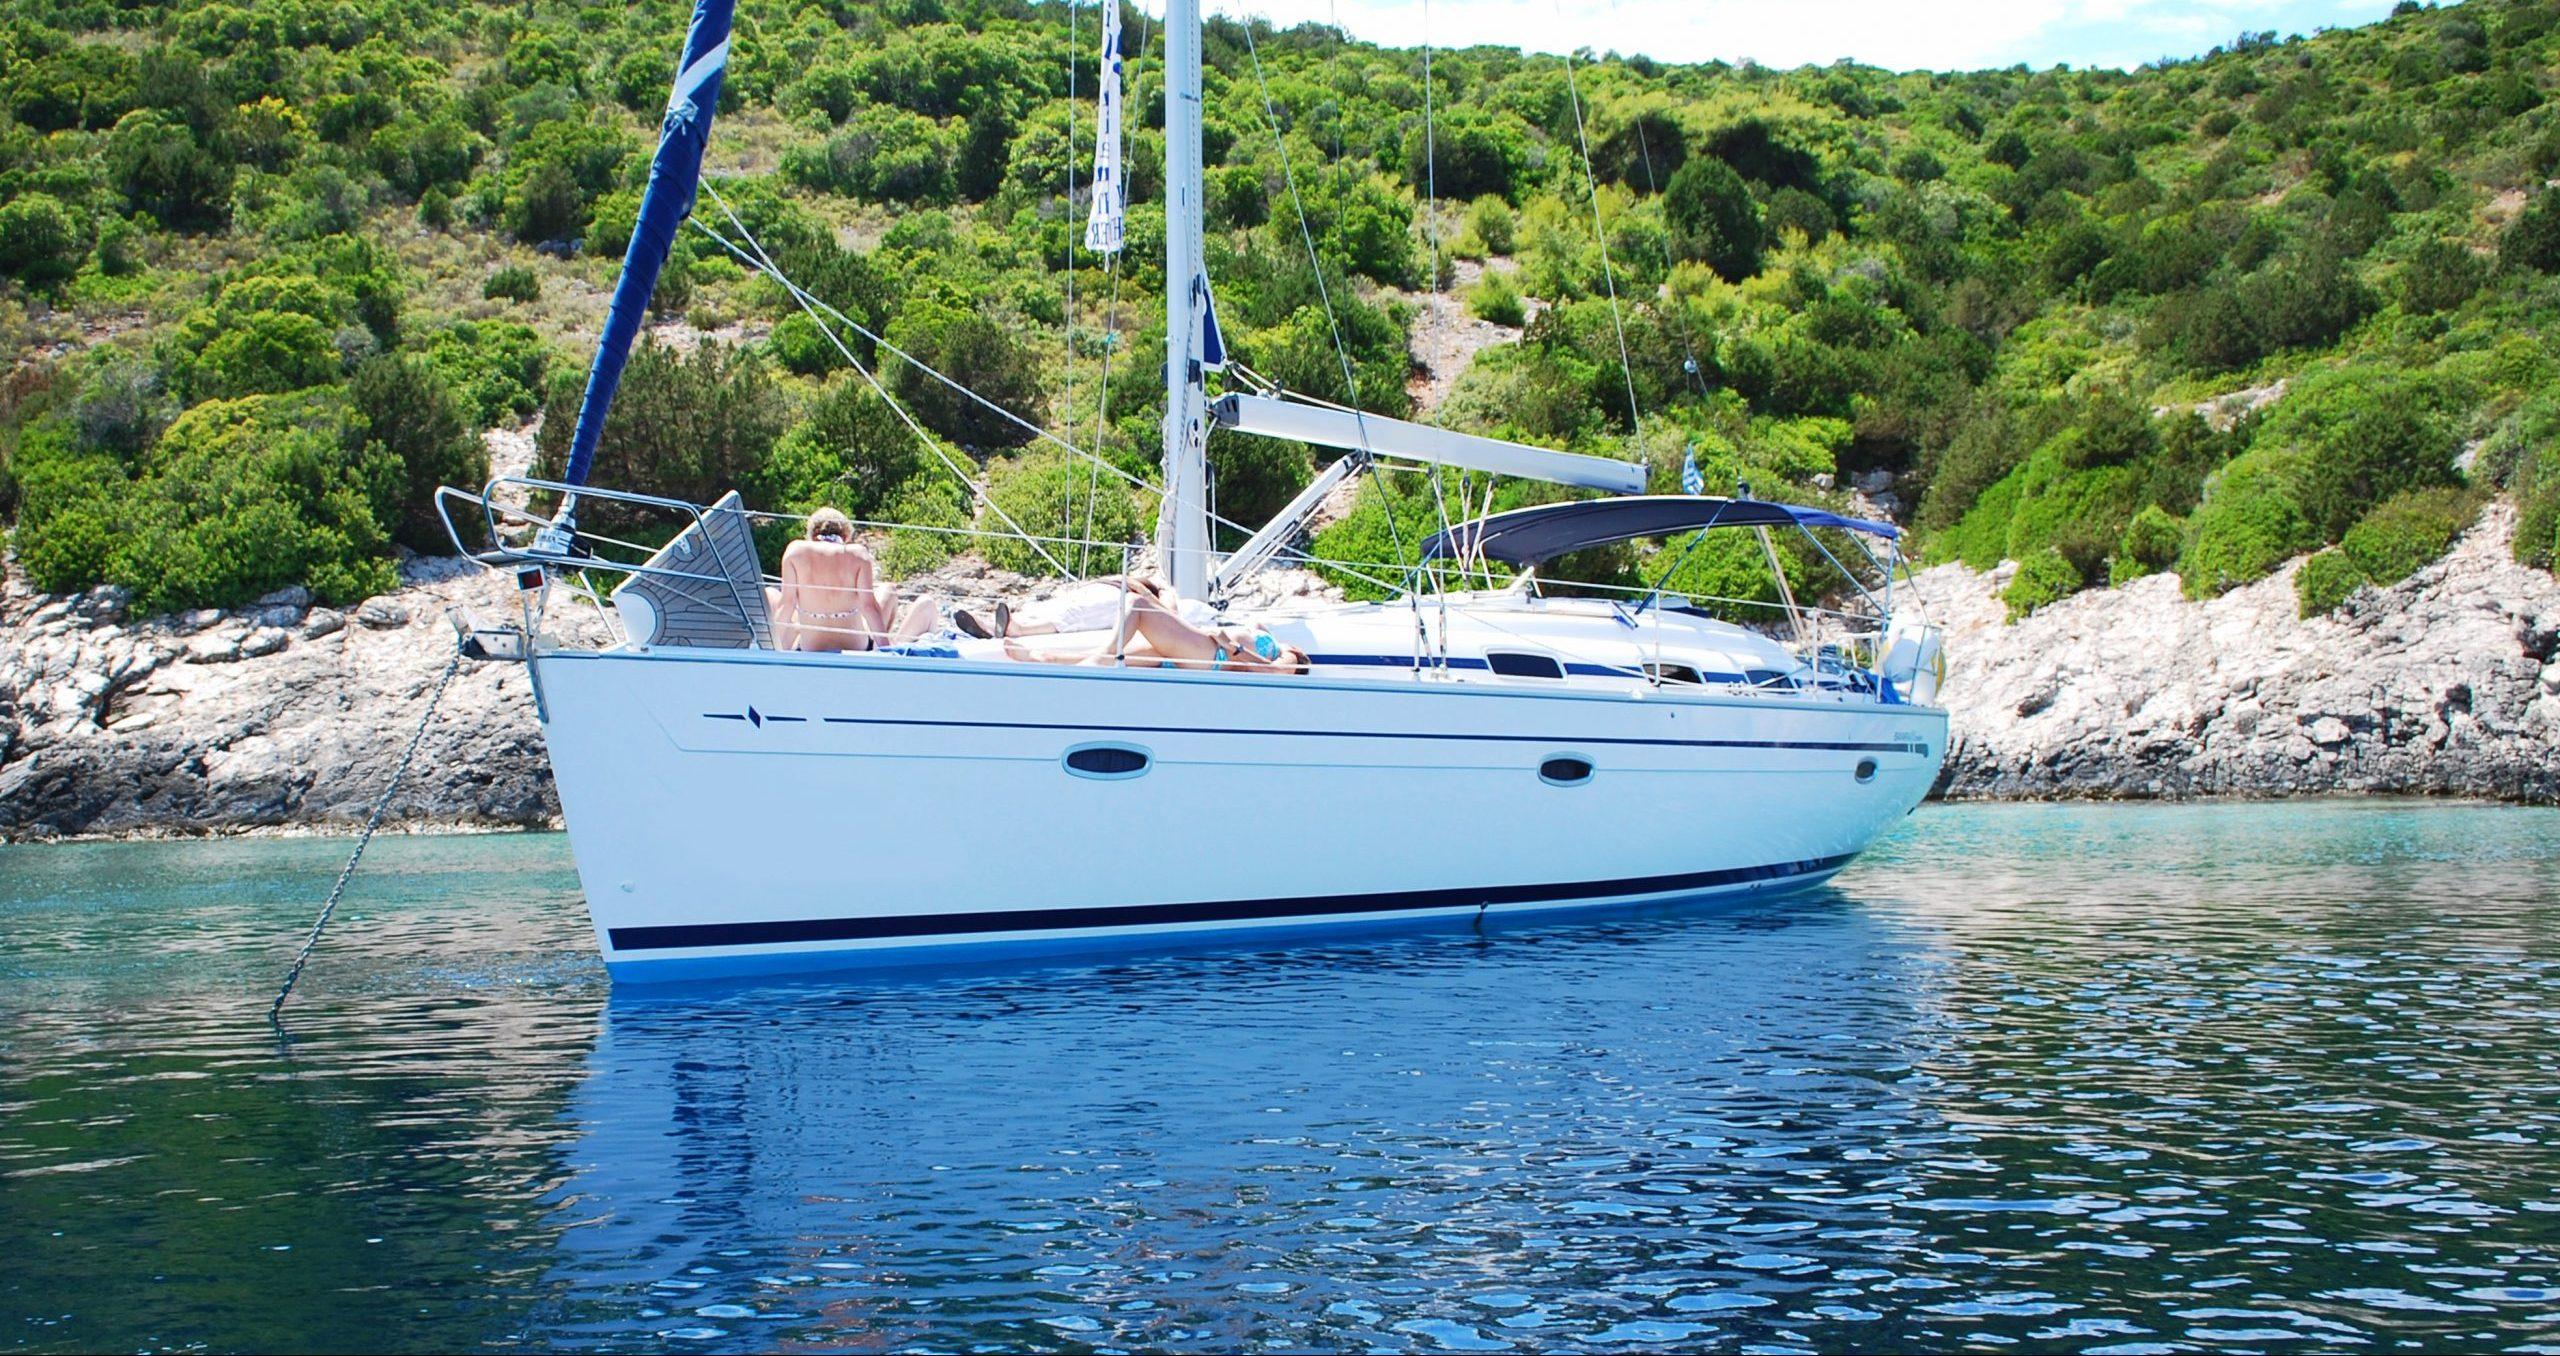 bavaria 39 for sale